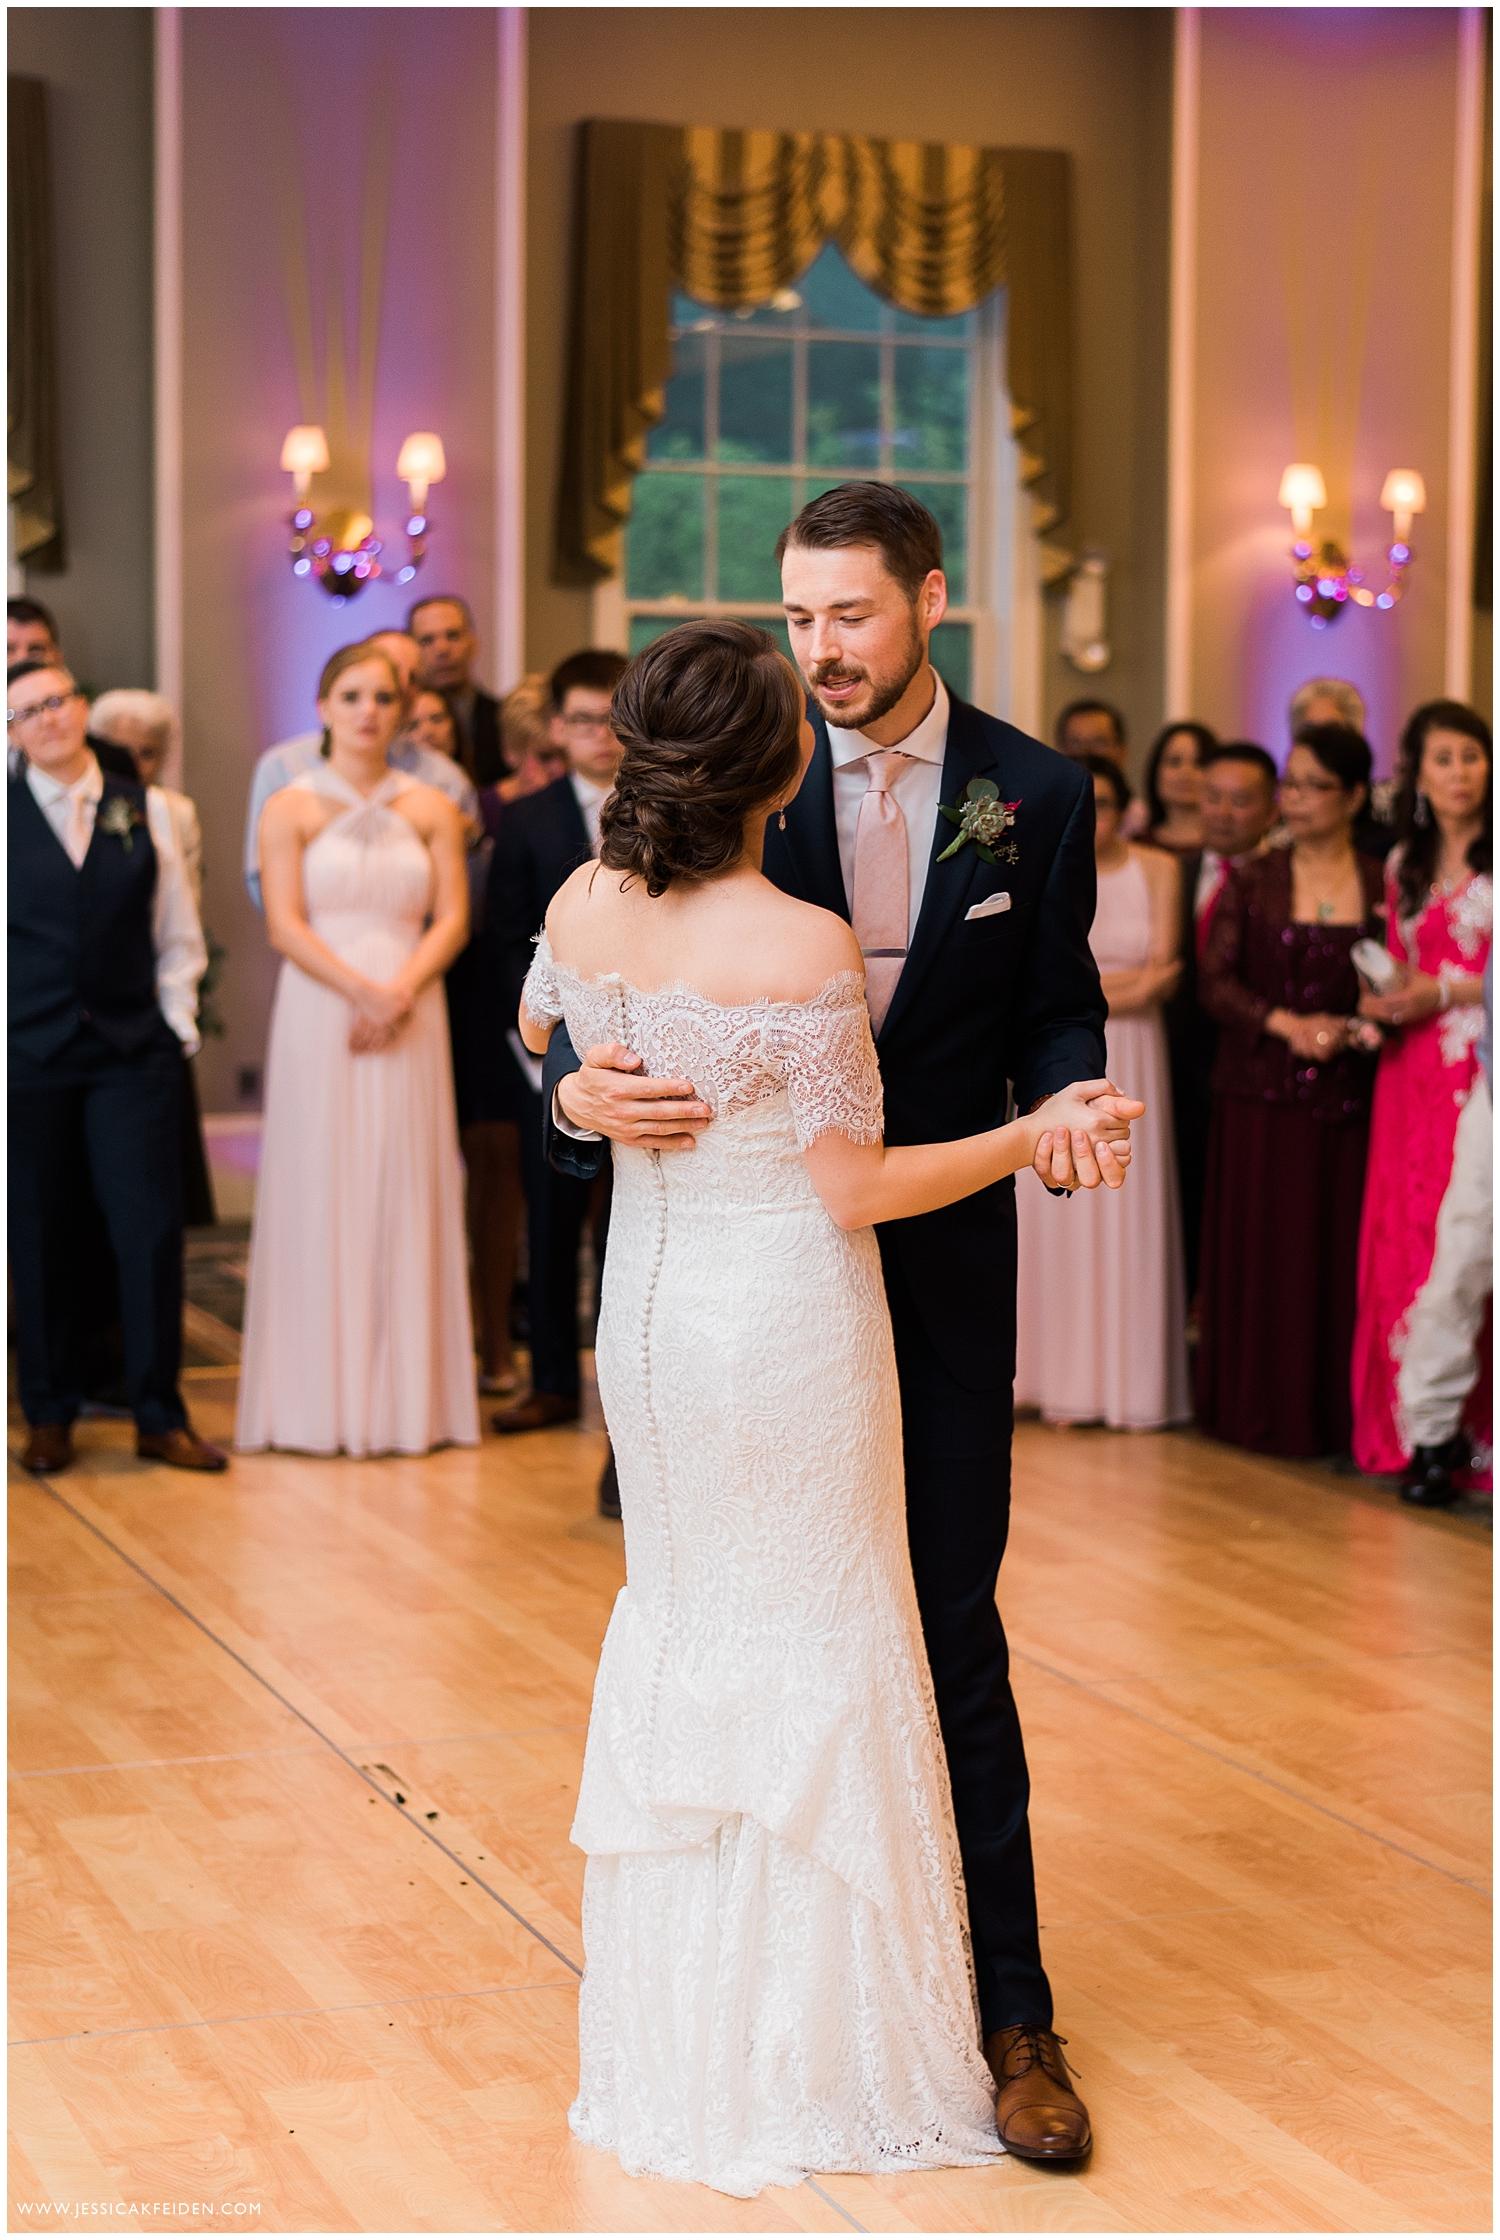 Jessica K Feiden Photography_Charter Oak Country Club Wedding_0068.jpg